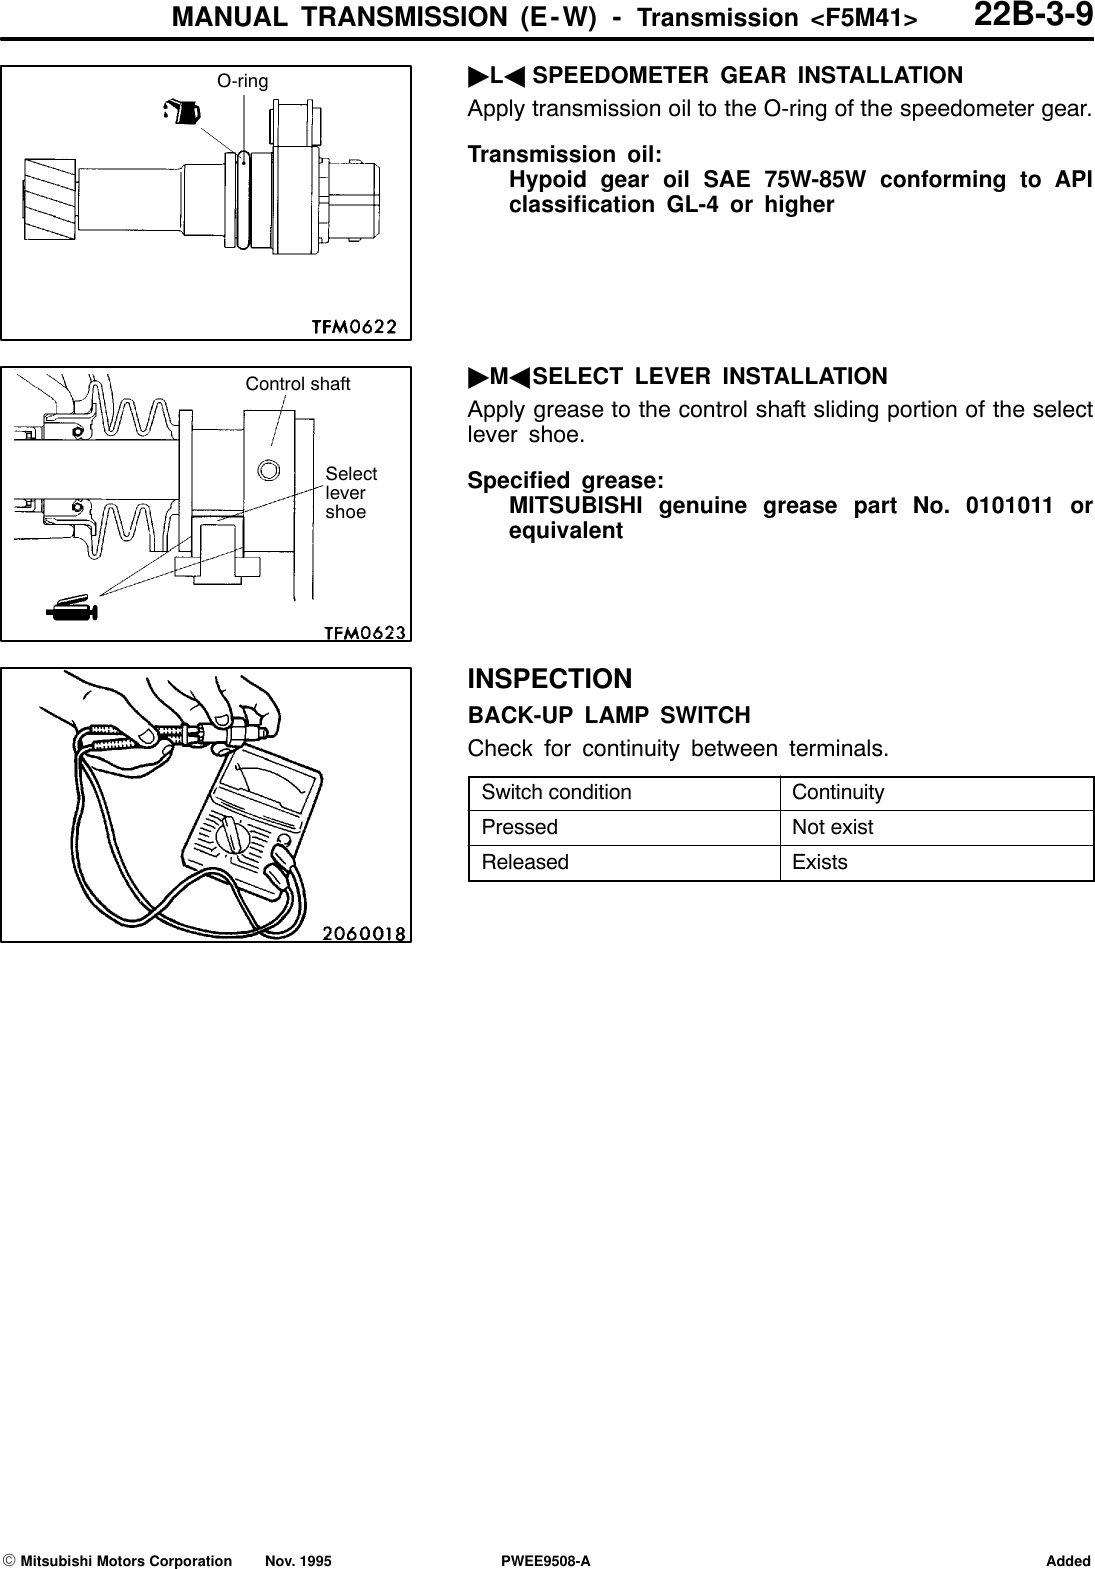 Mitsubishi Motors Automobile Parts F5M41 Users Manual TRANSMISSION